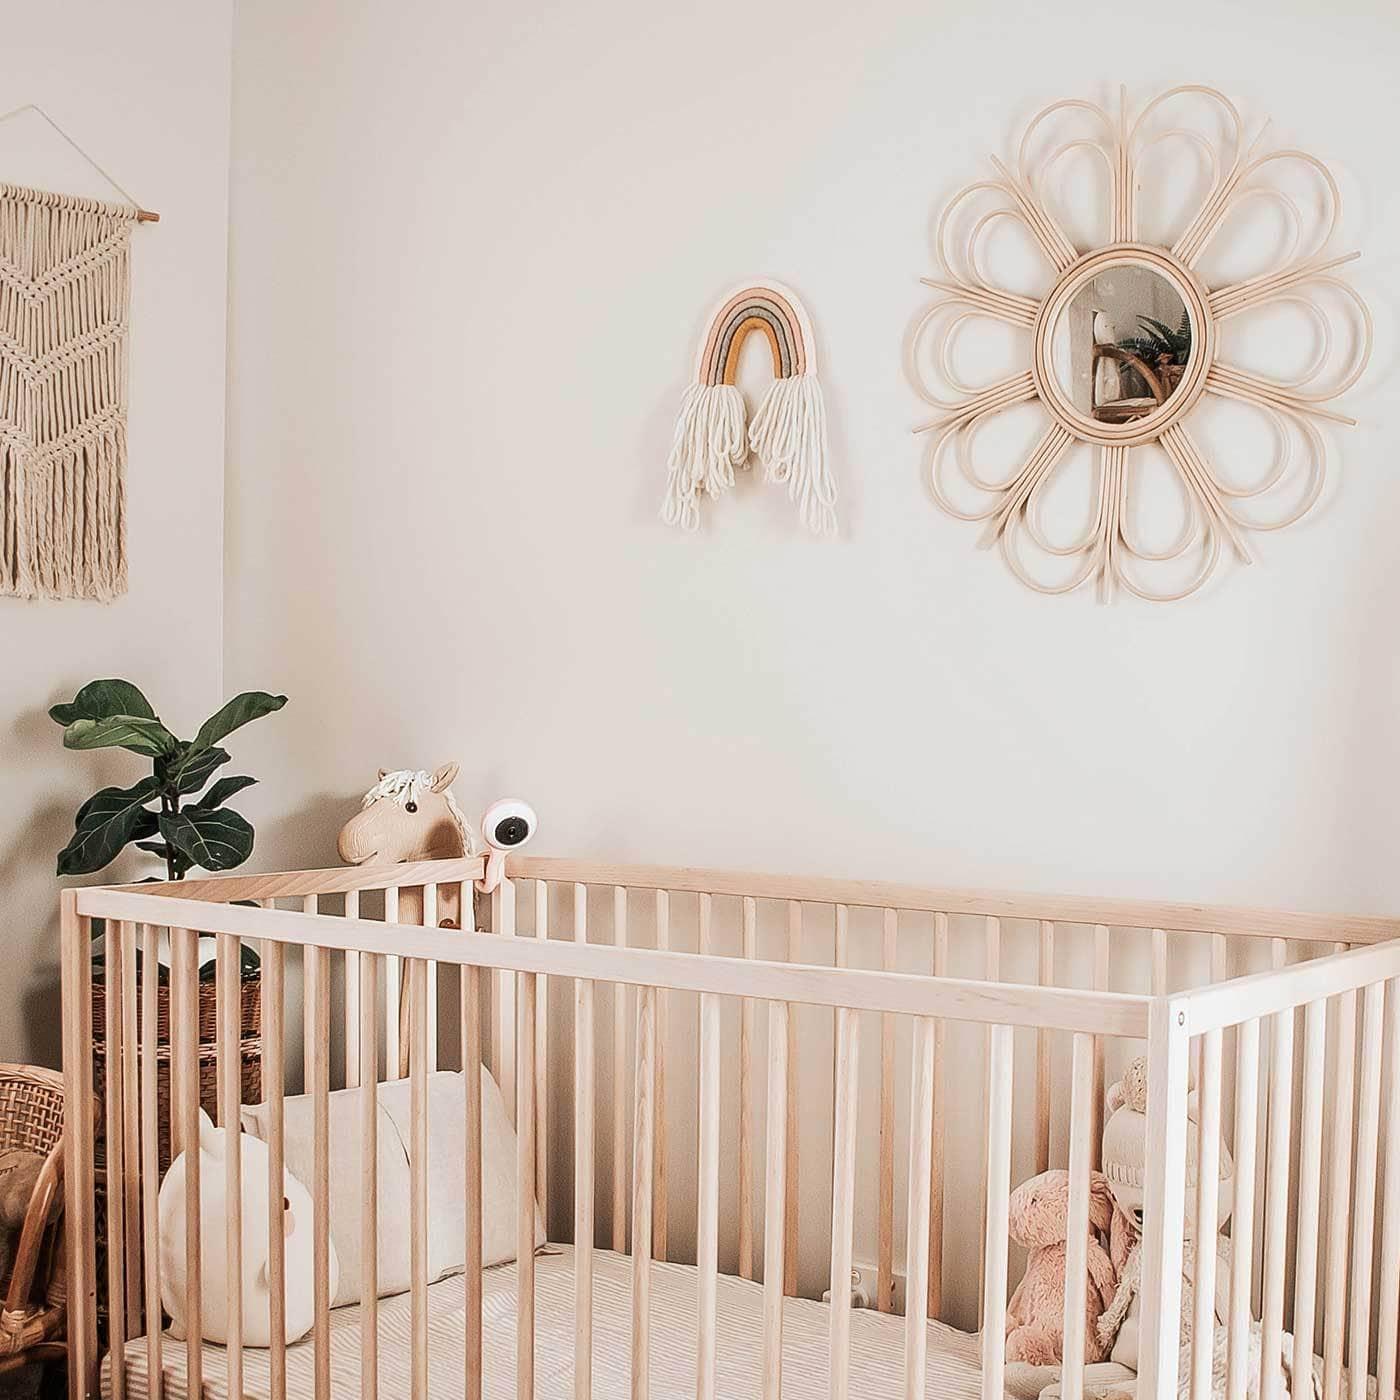 rattan flower mirror in bohemian baby nursery boho decor ideas